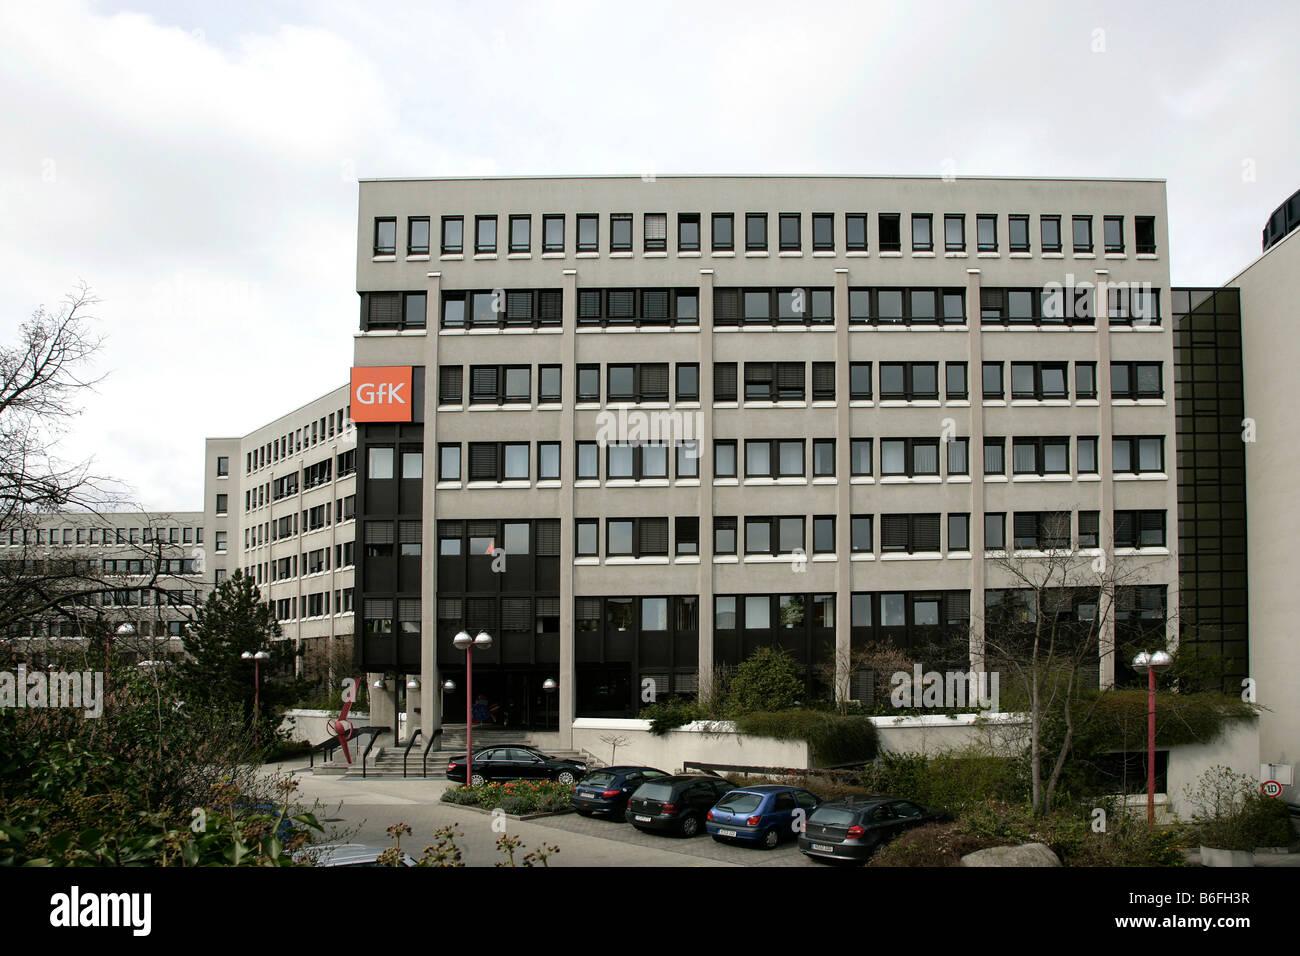 Head office of the GfK AG, Gesellschaft fuer Konsumforschung or Consumer Research Enterprise, in Nuremberg, Bavaria, Stock Photo